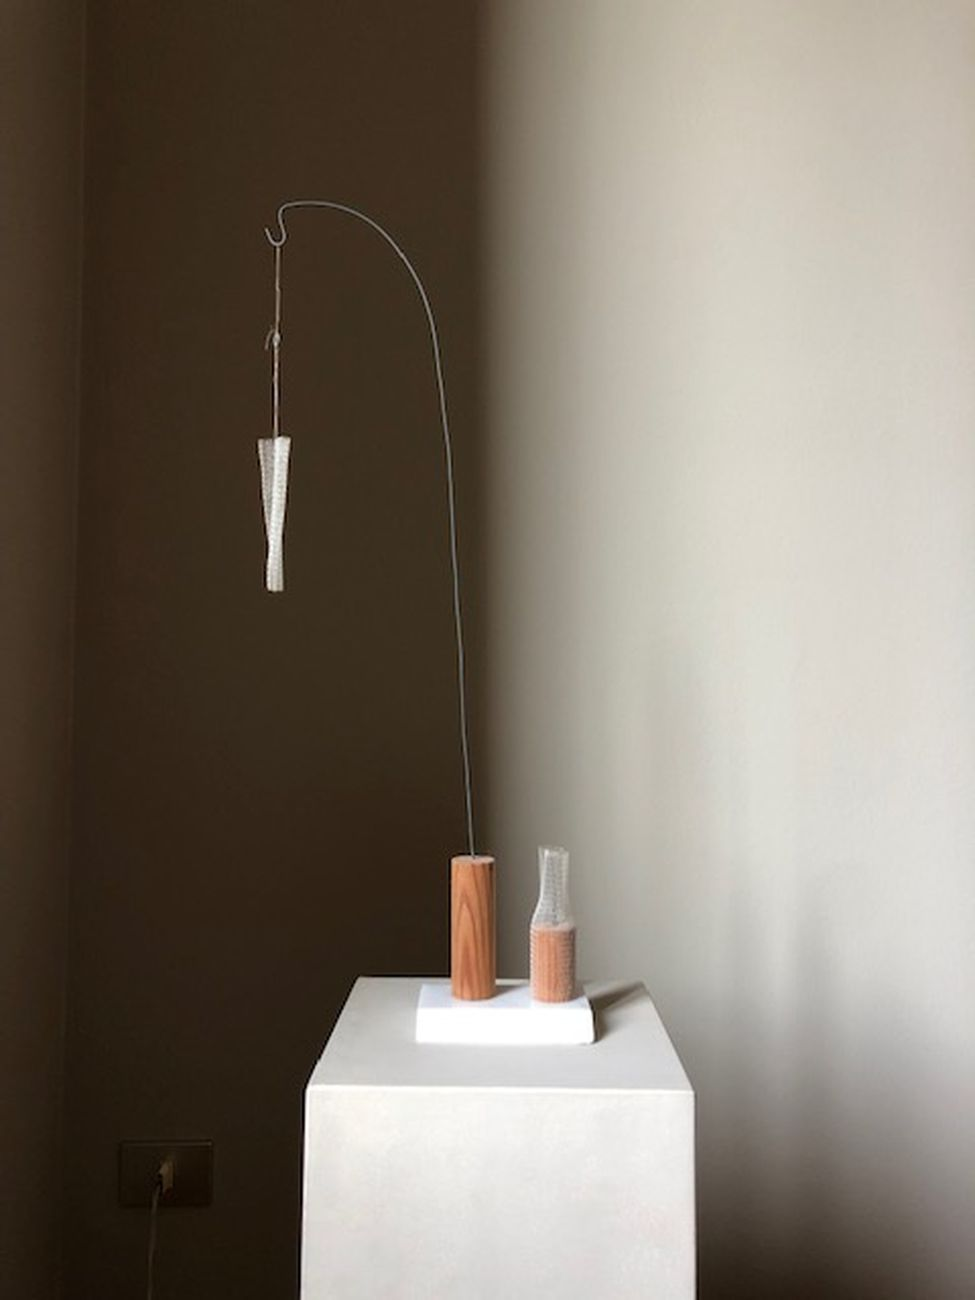 B. Wurtz, Untitled, 2011, courtesy Carlo Prada e Office Baroque